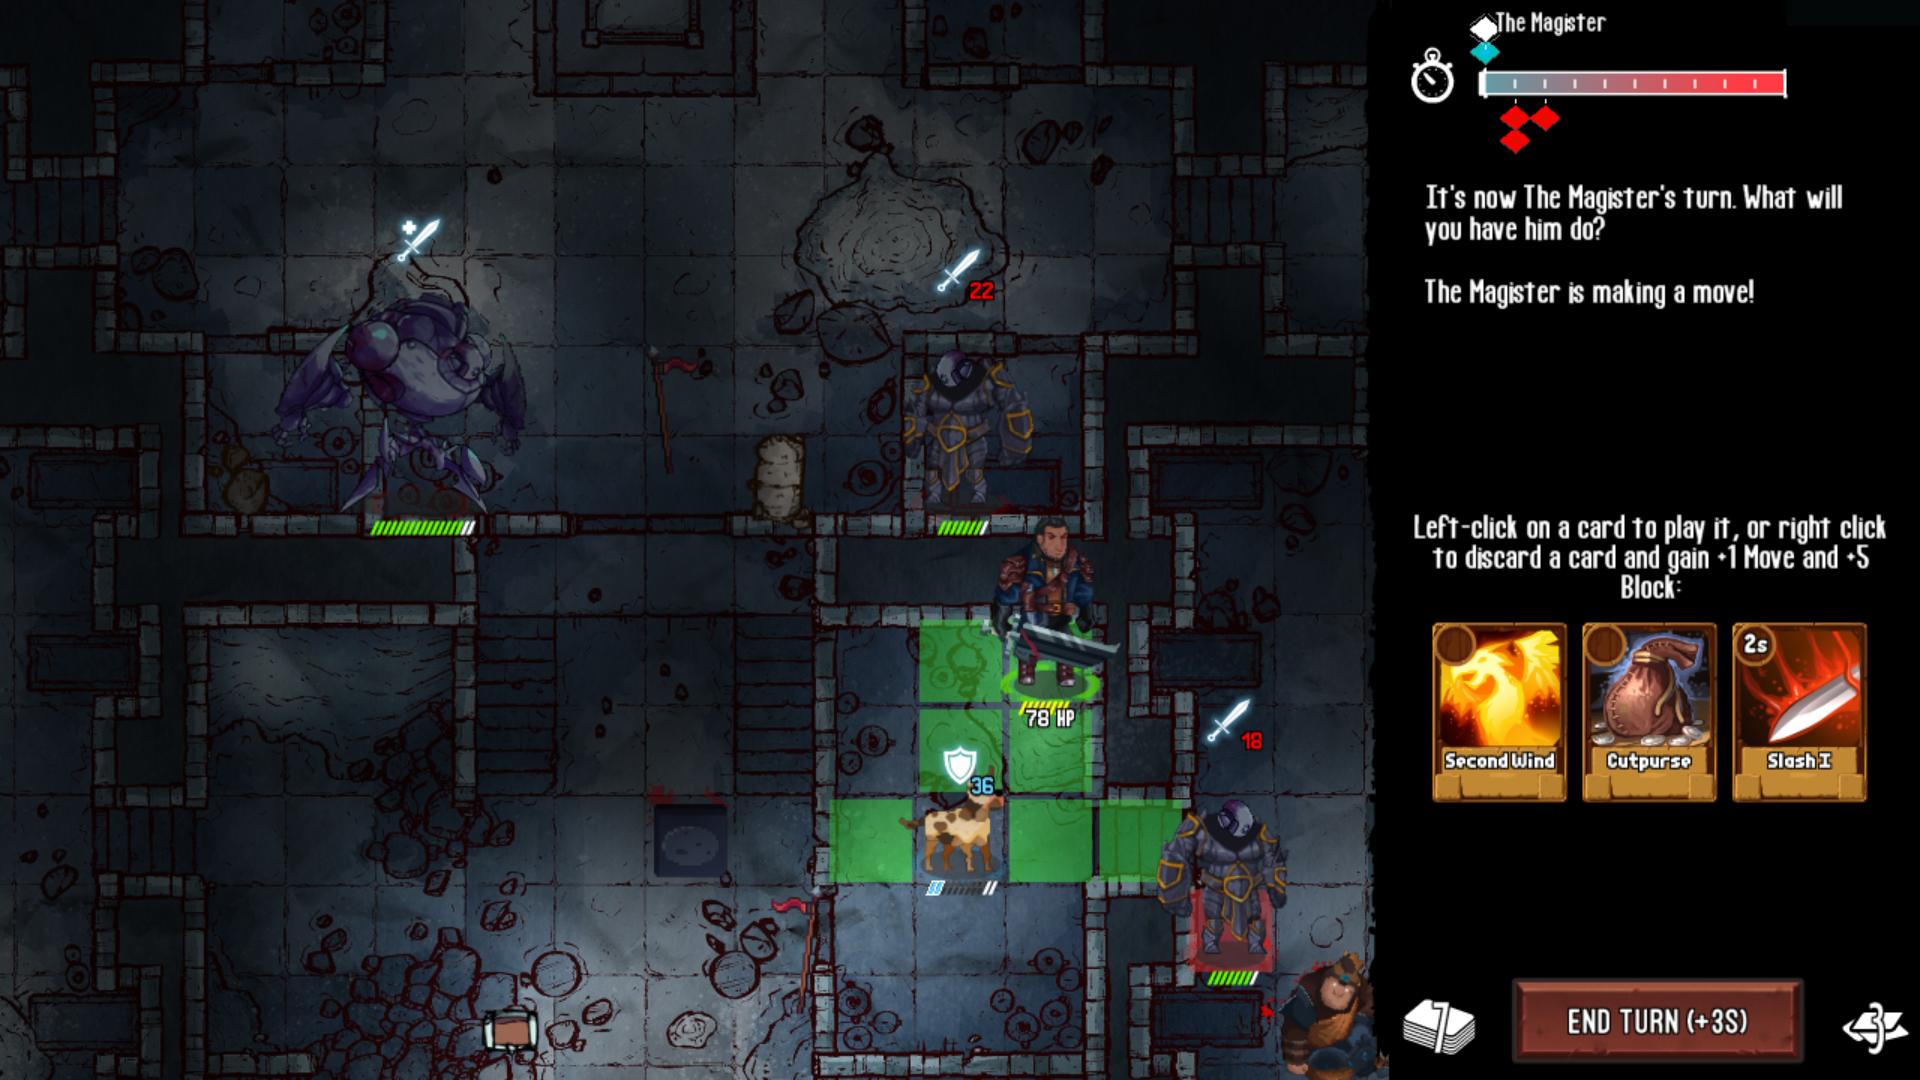 Screenshot of The Magister